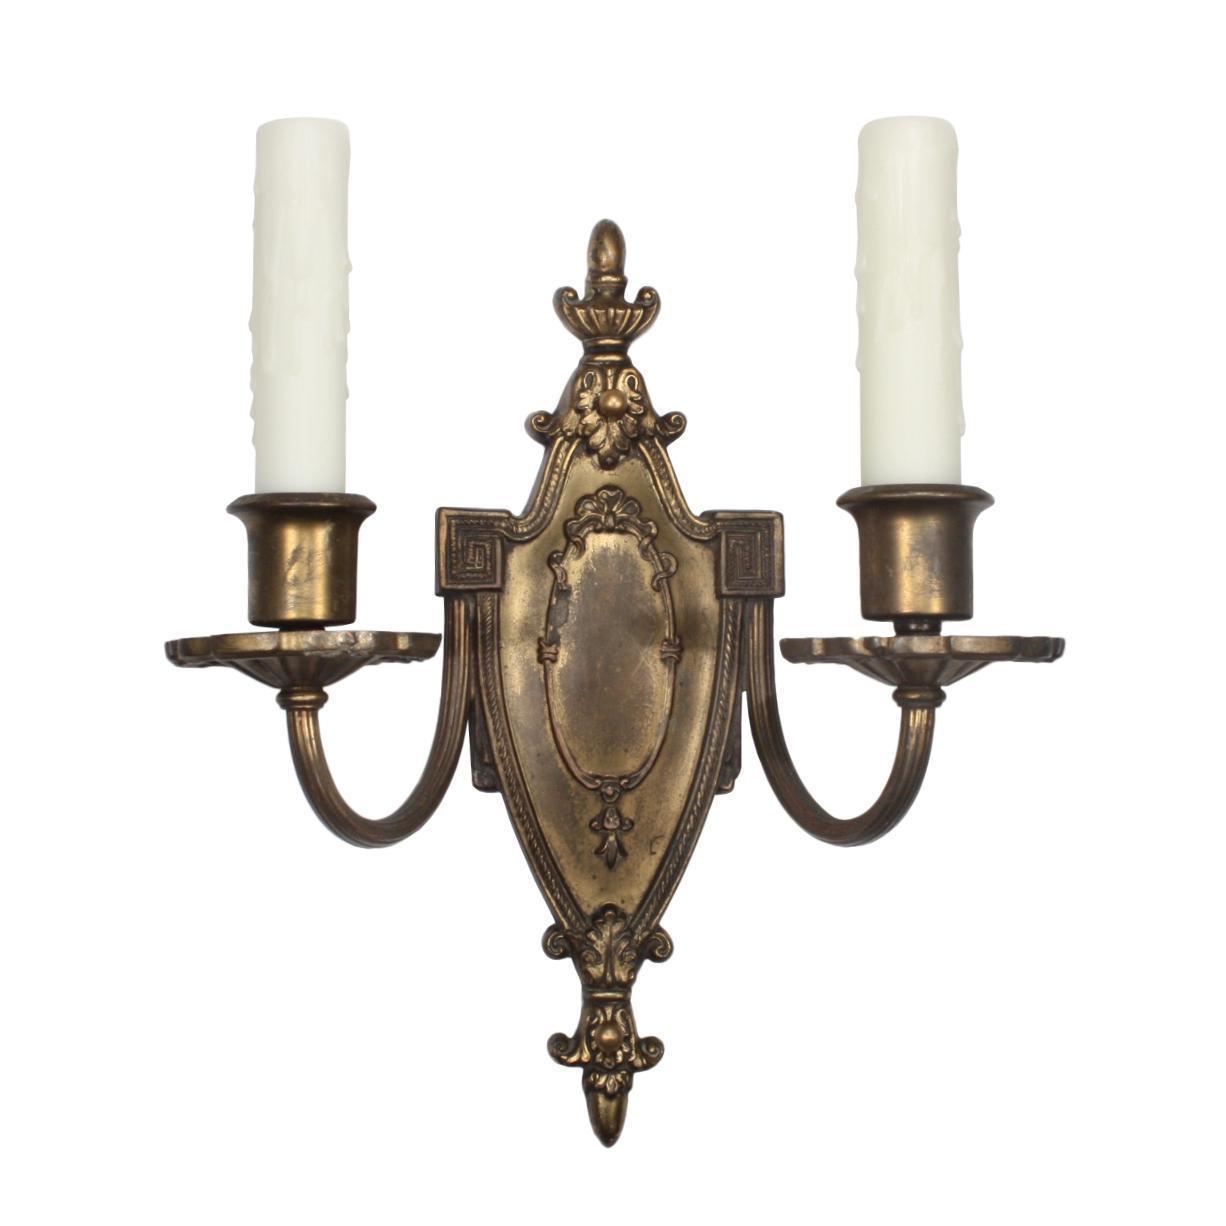 Splendid Antique Neoclassical Double-Arm Sconce